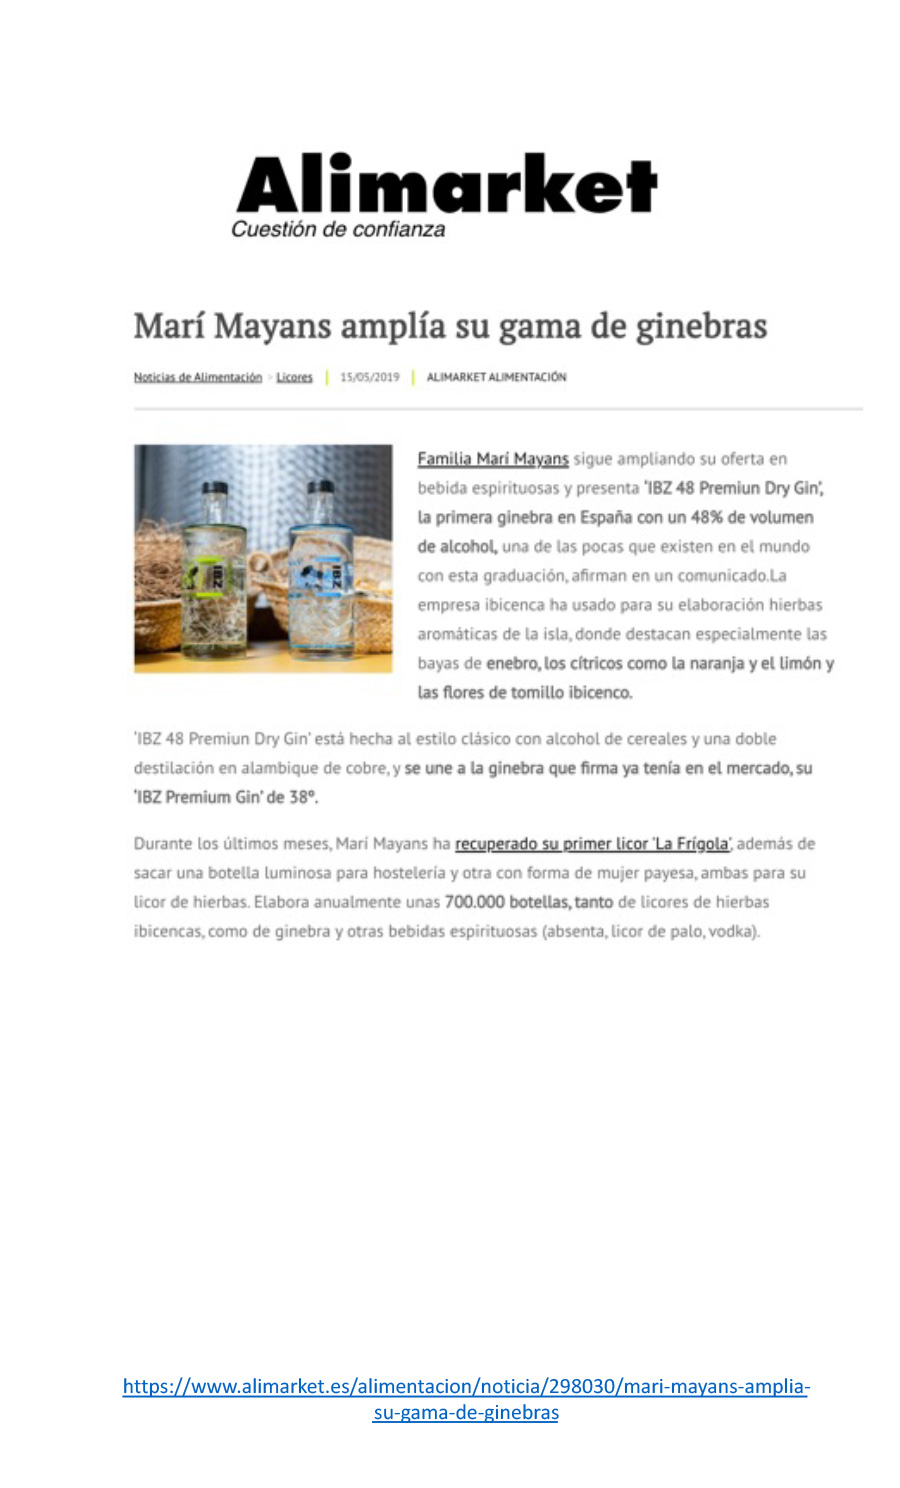 15/05/2019 - Alimarket - Familia Marí Mayans